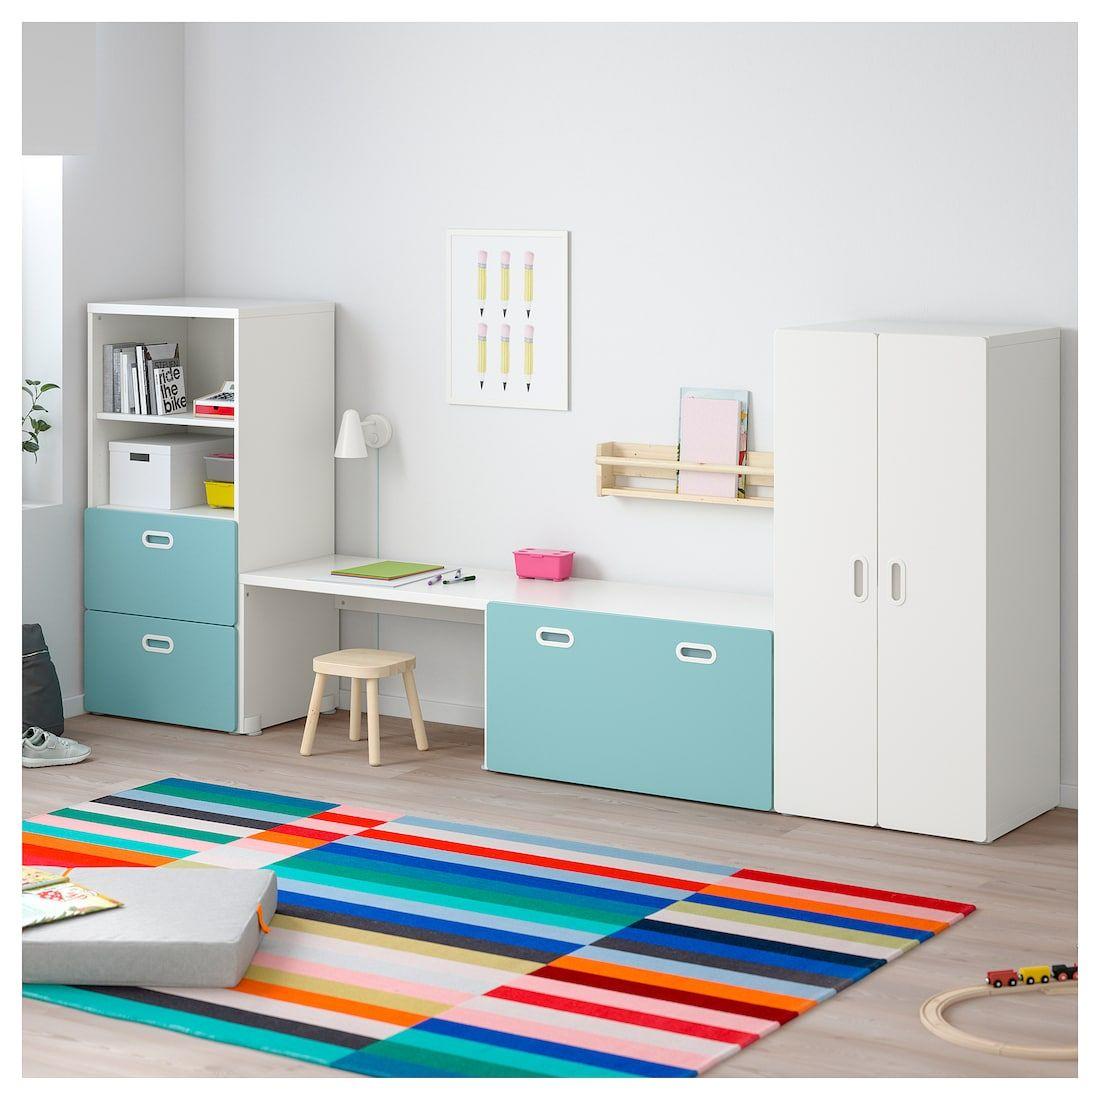 STUVA / FRITIDS Storage combination white, light blue